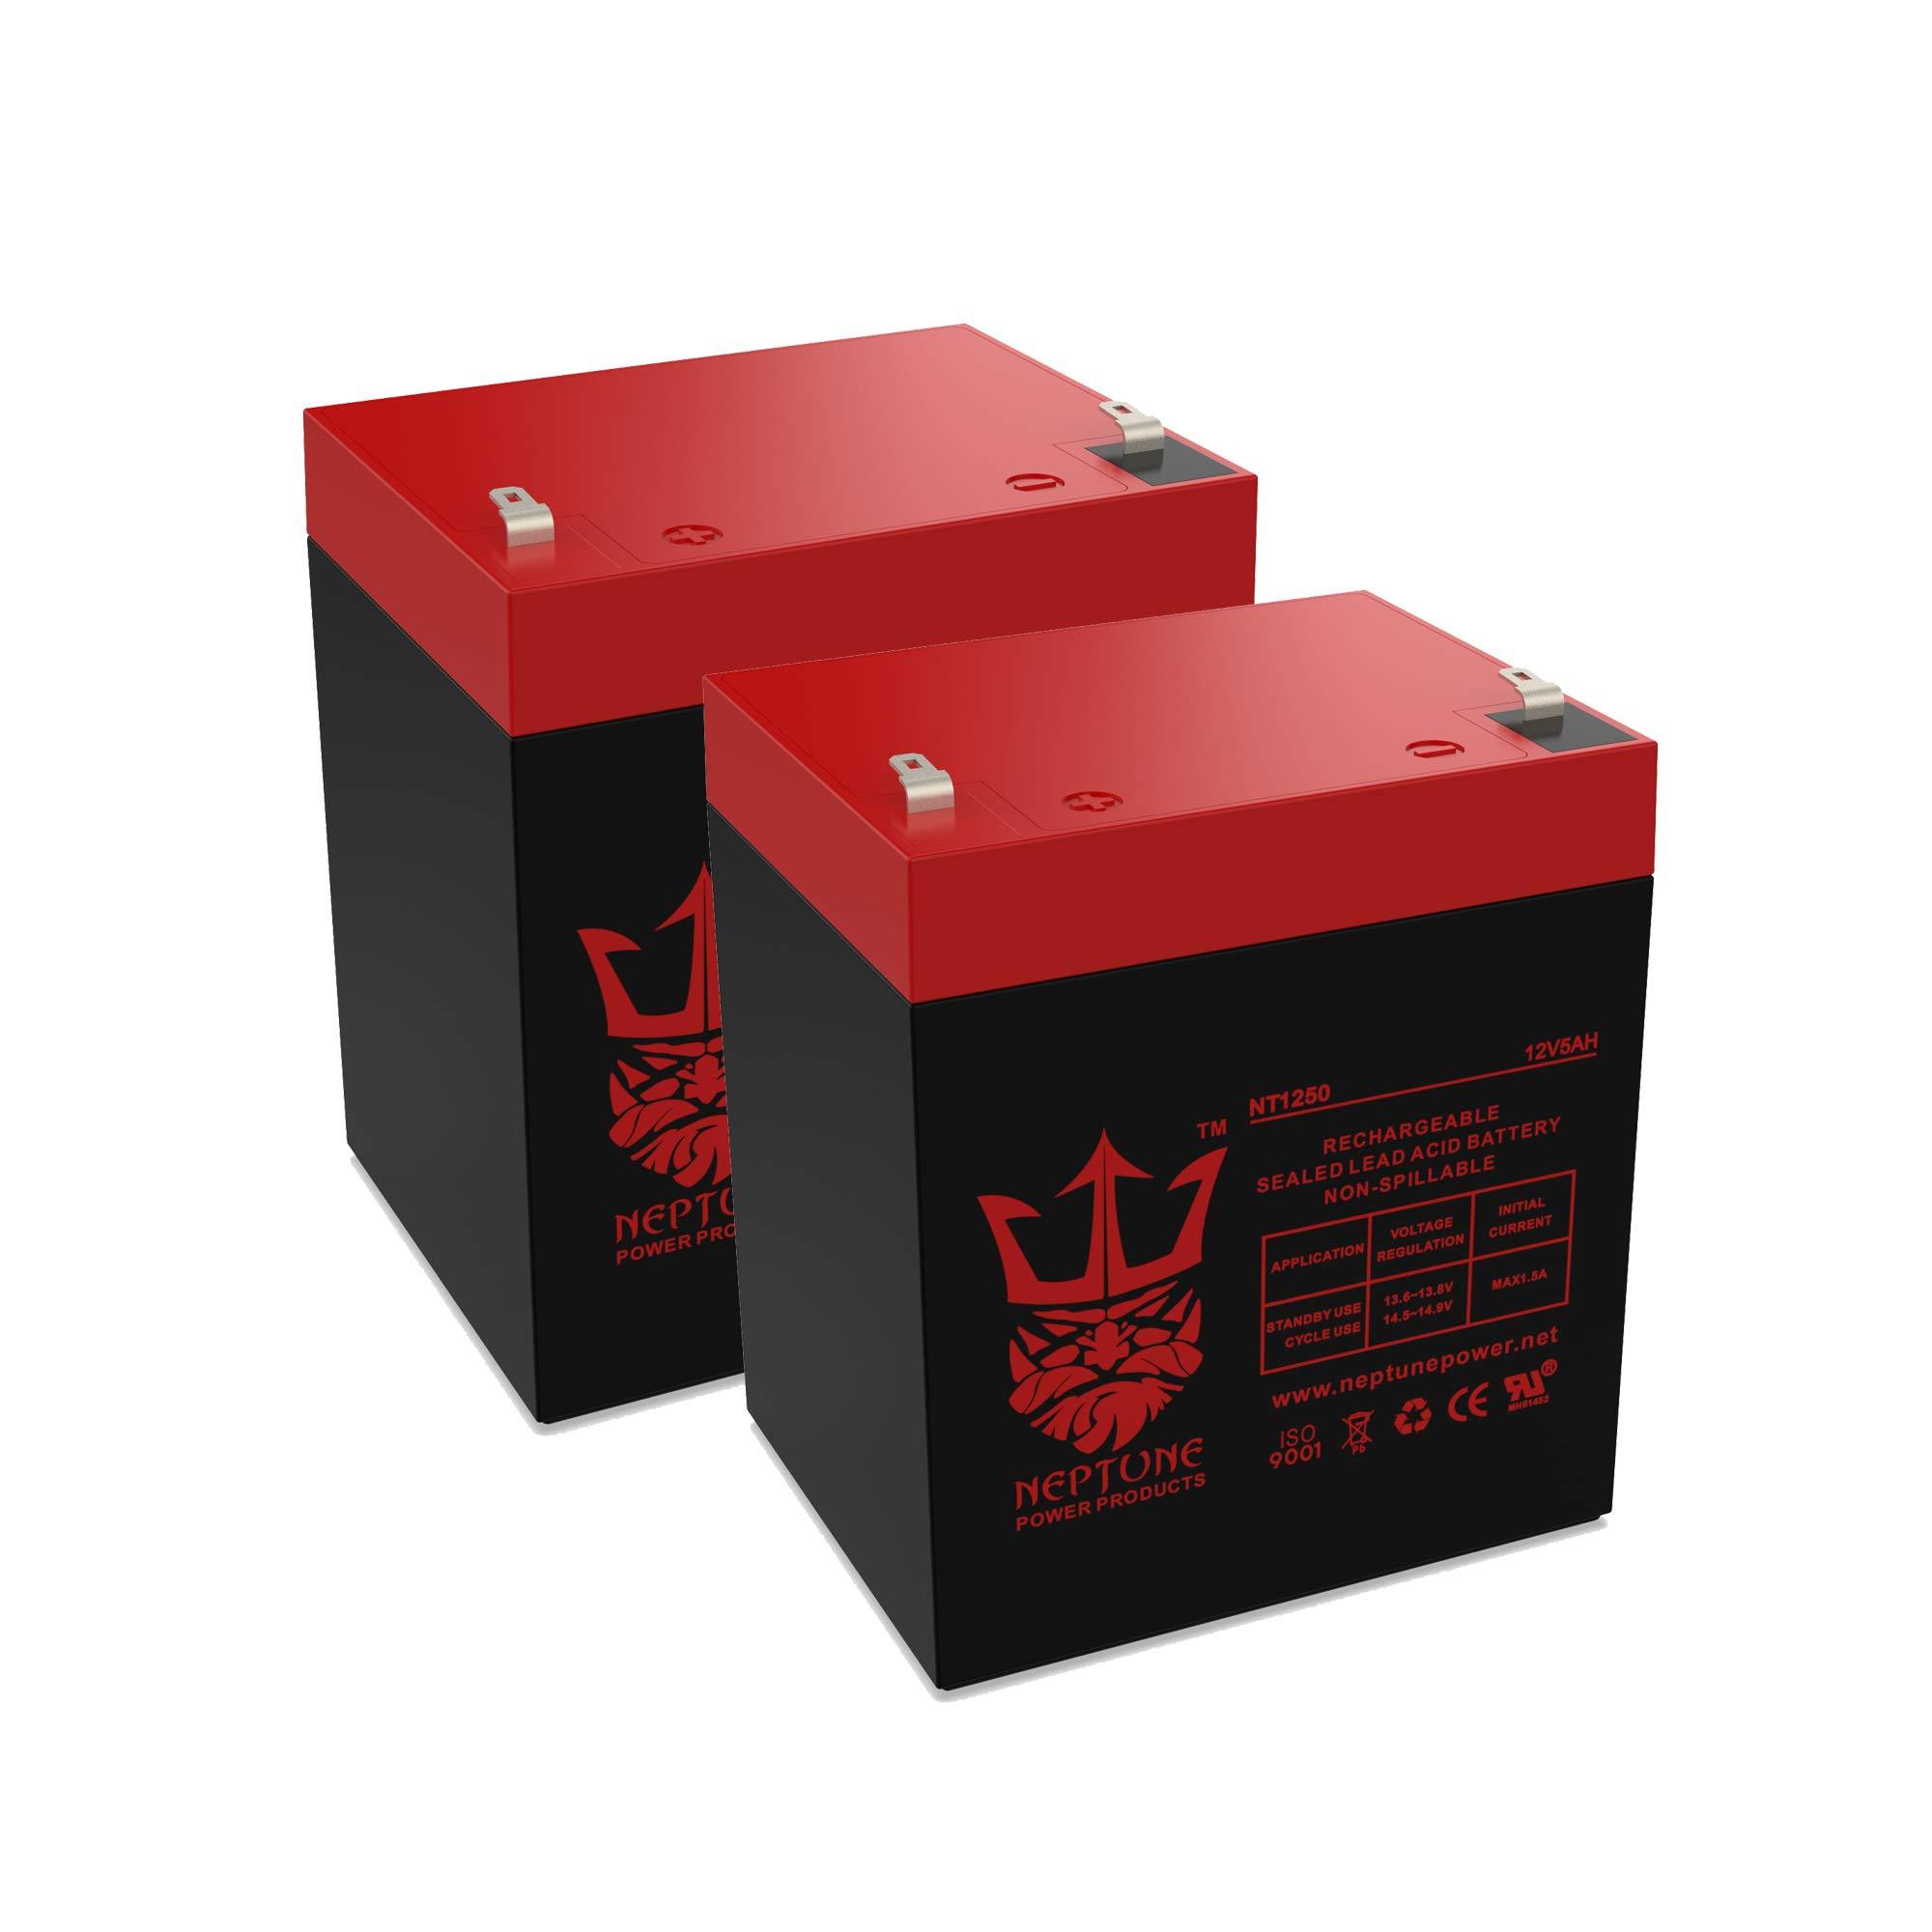 Neptune 12V 5Ah NT-1250 Rechargeable SLA Sealed Lead Acid Battery - 2 Pack